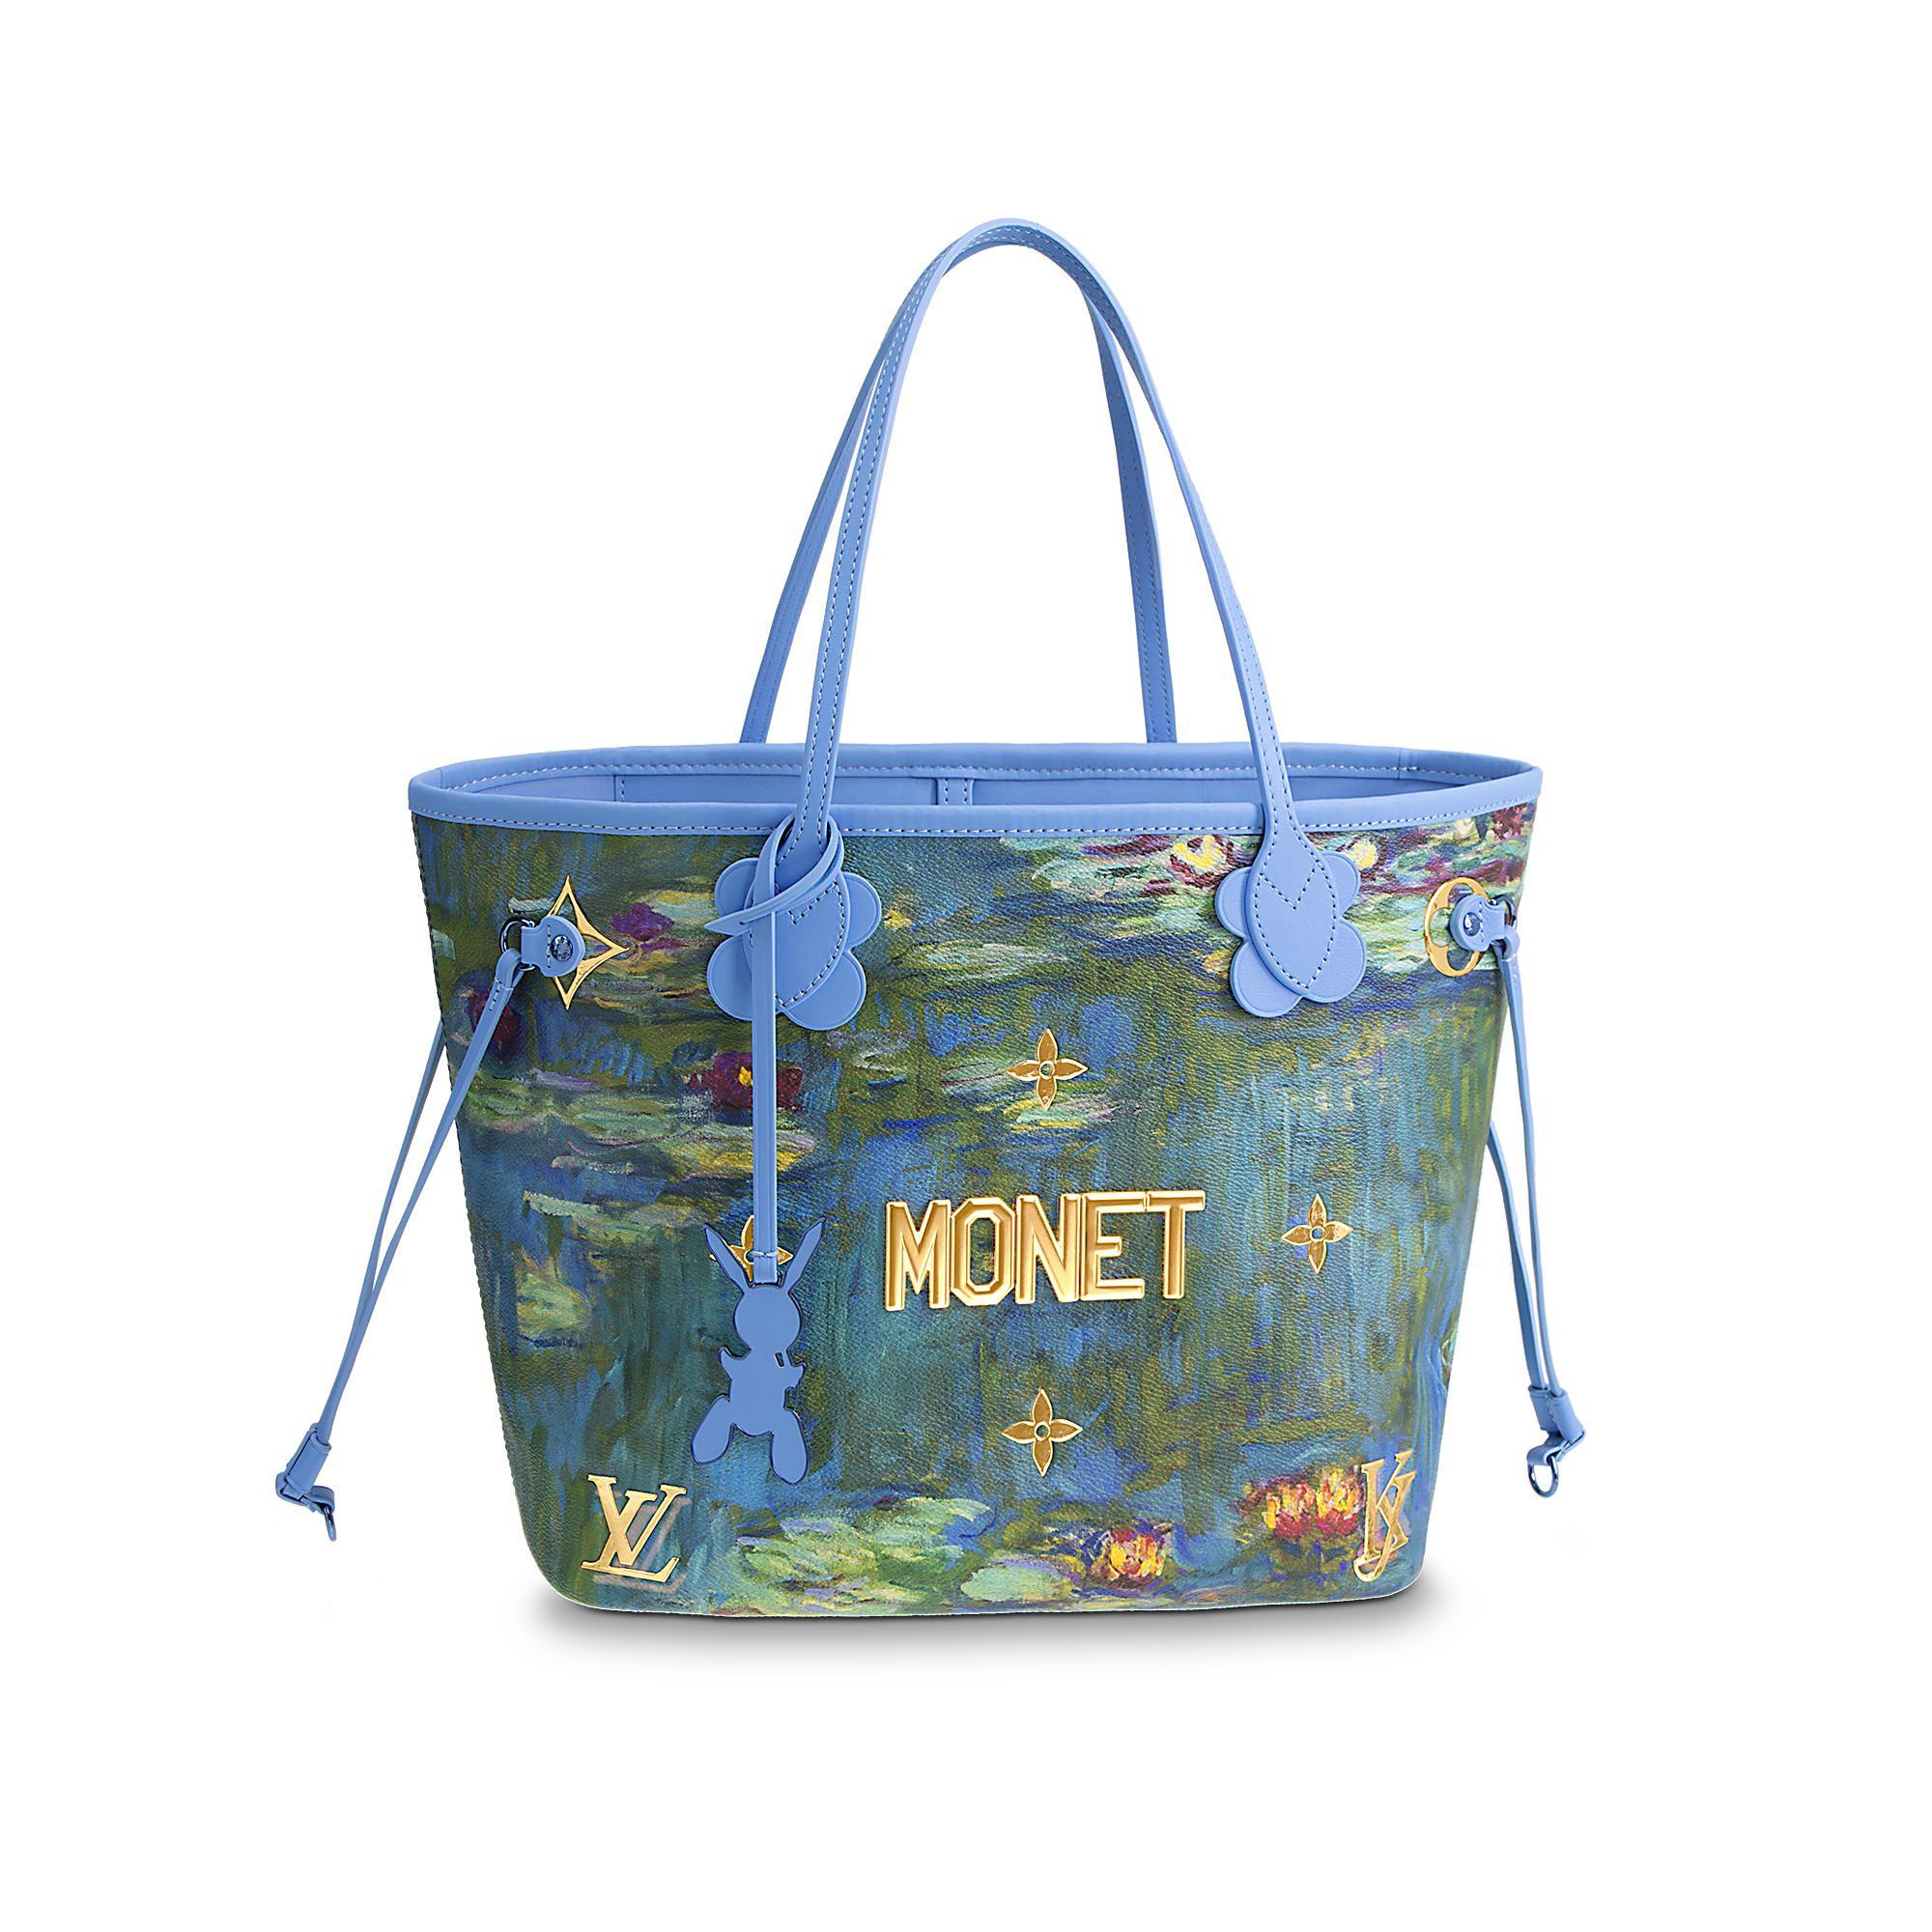 Anyone Wanna B My Secretsanta Get Me This Monet Louisvuitton I M All 4 It Image In Masters Lv X Koons